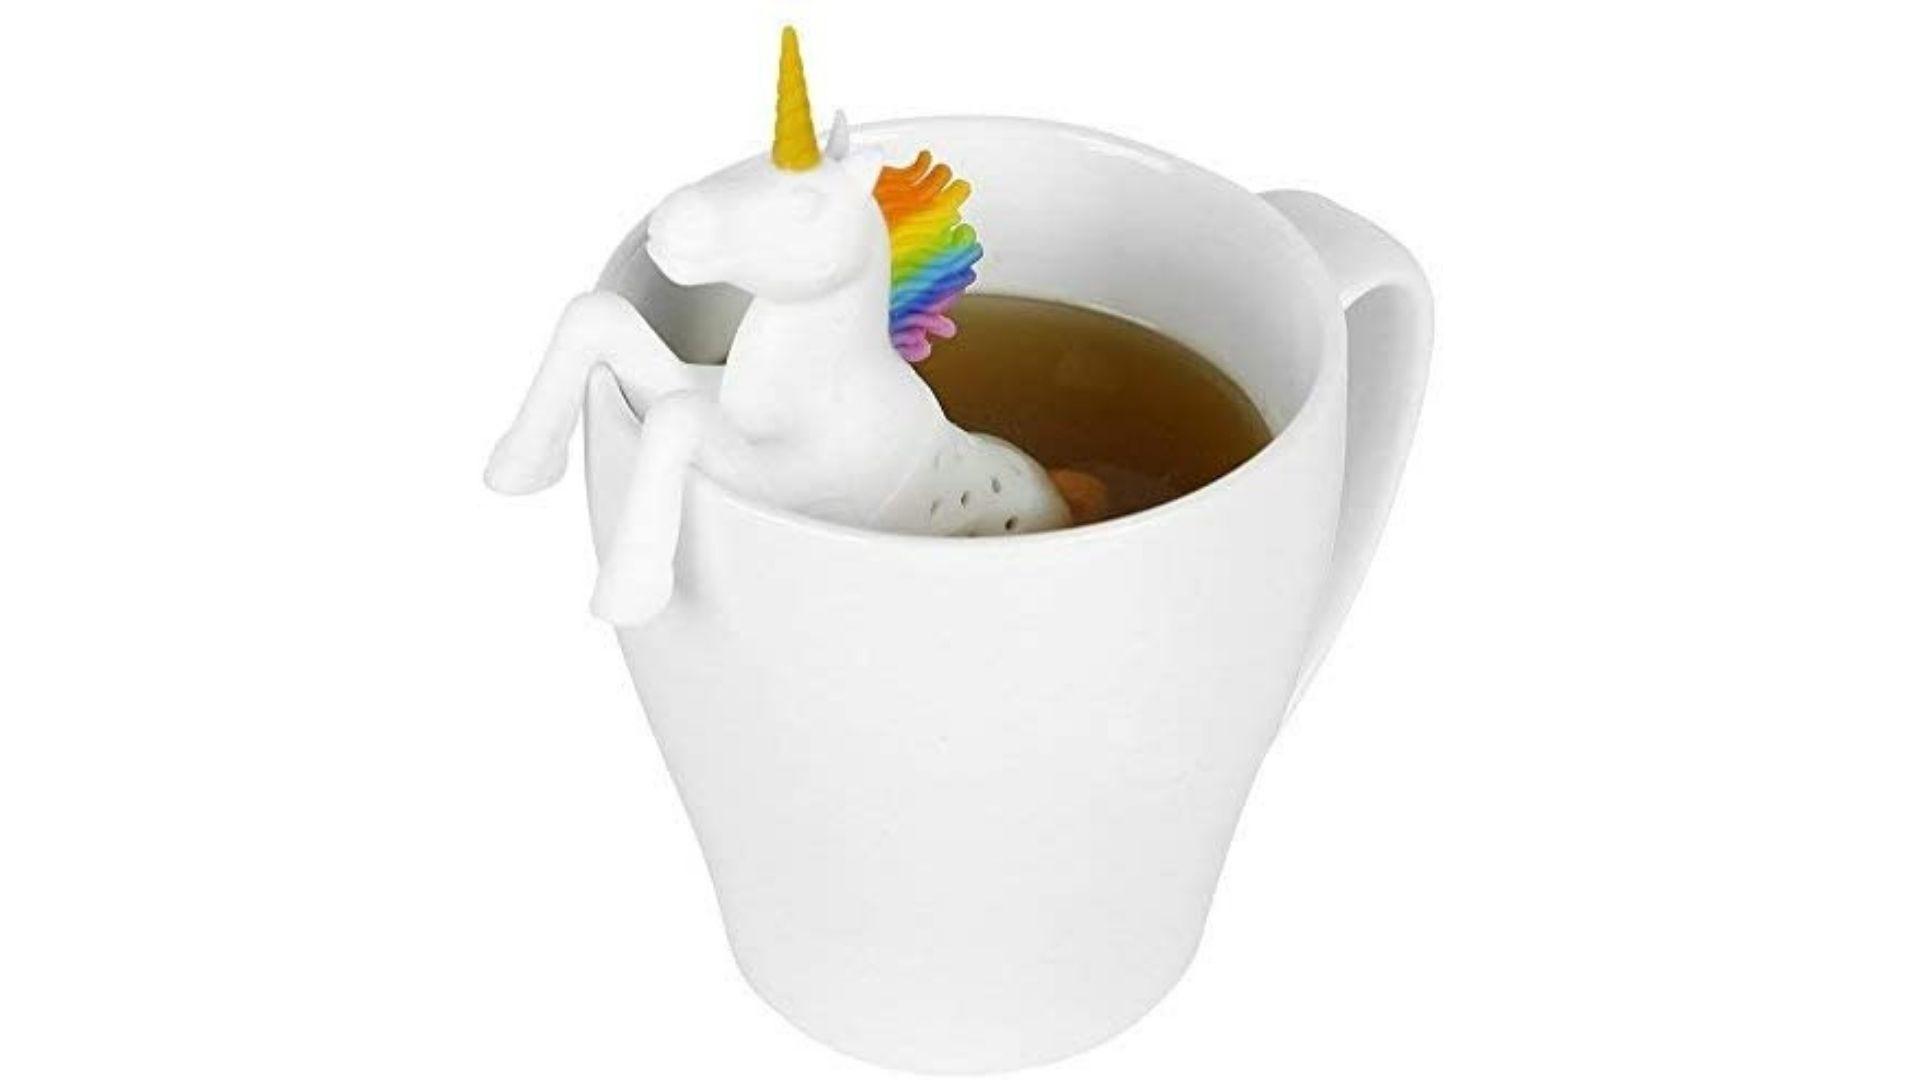 Unicorn tea strainer in a mug of water.